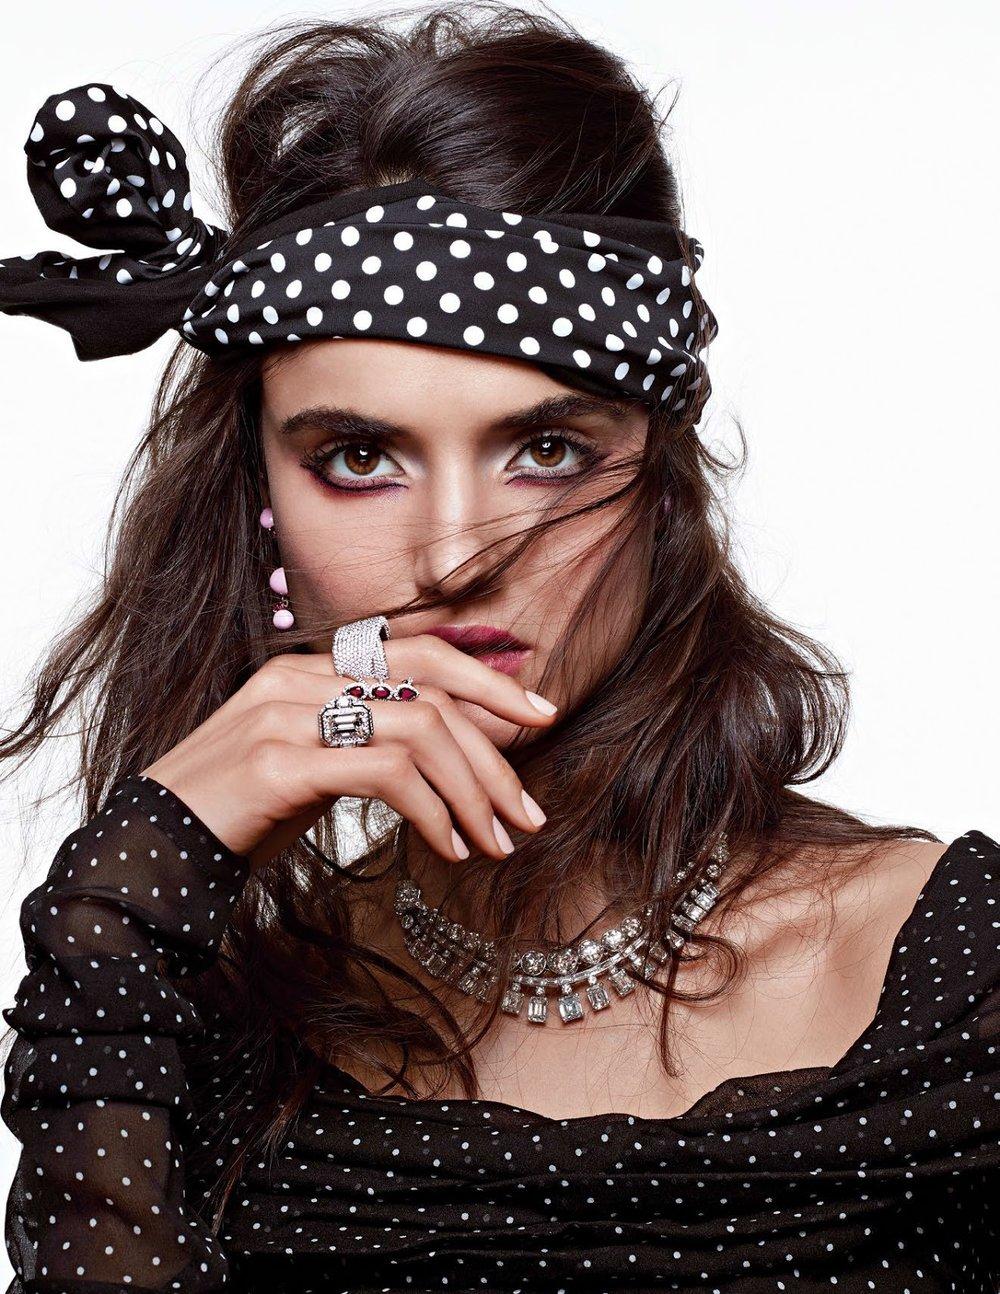 Vogue Arabia December 2017 - 2.jpg